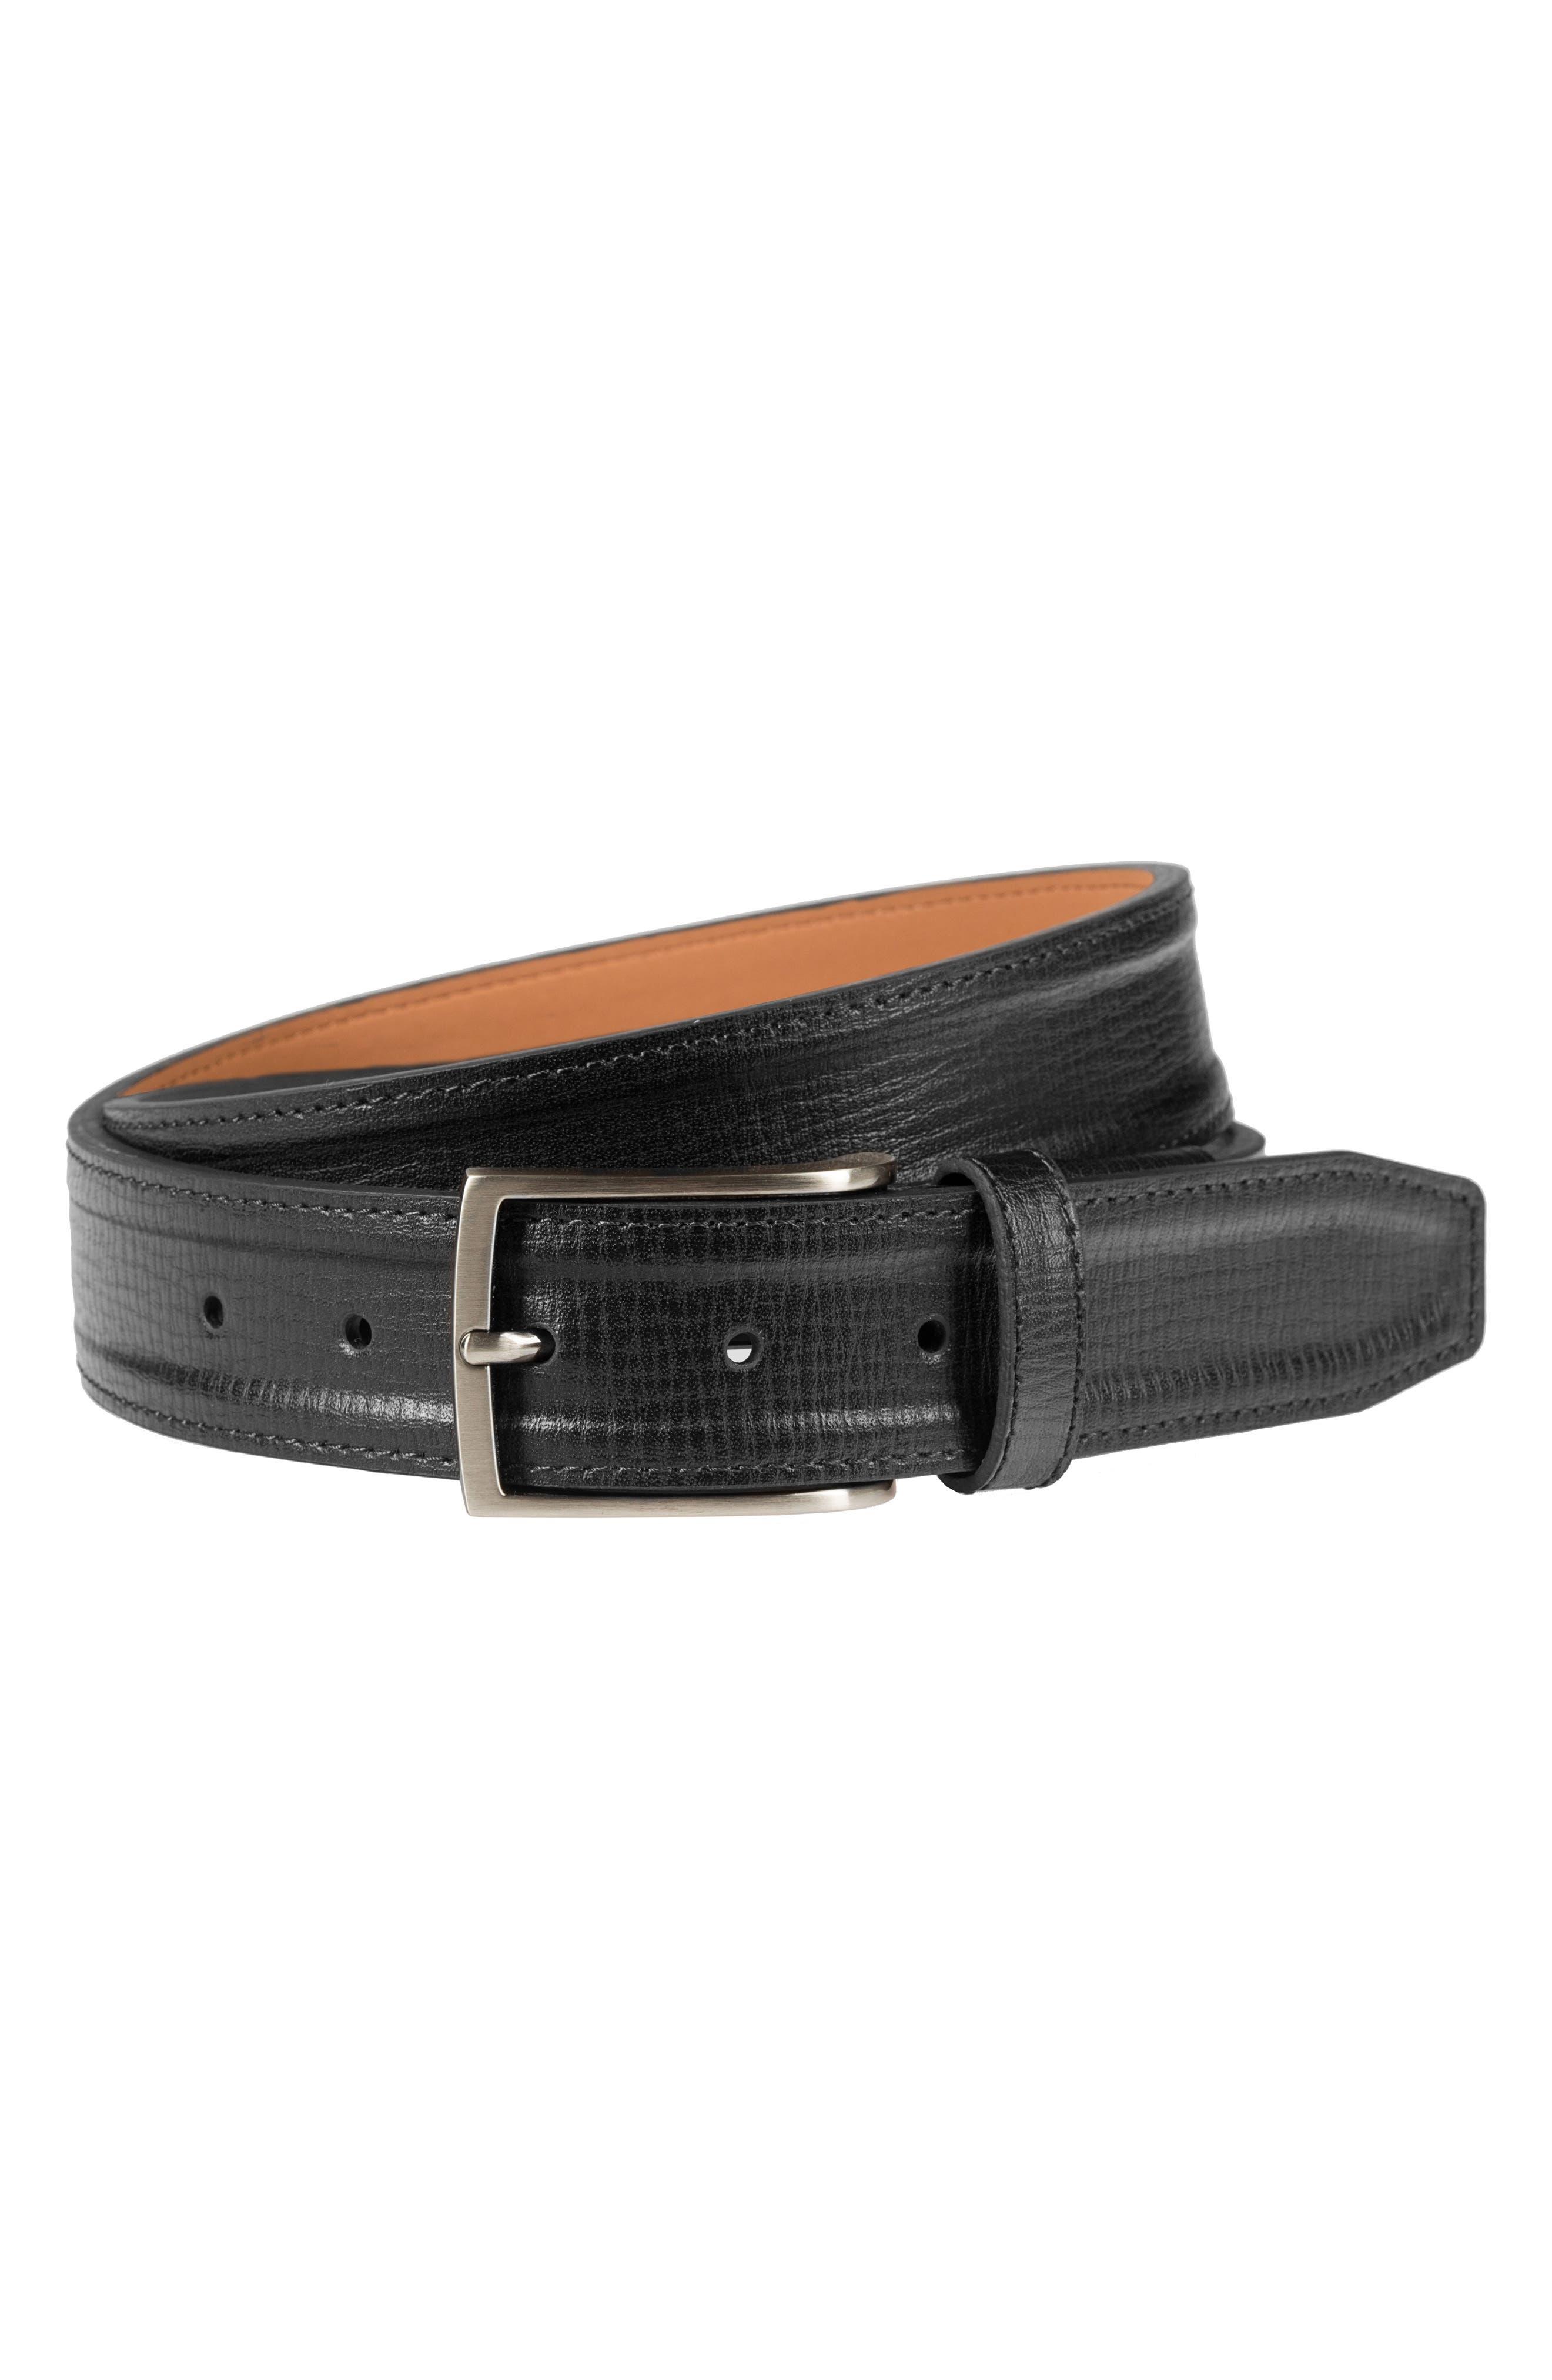 Nike Trapunto G Flex Leather Belt